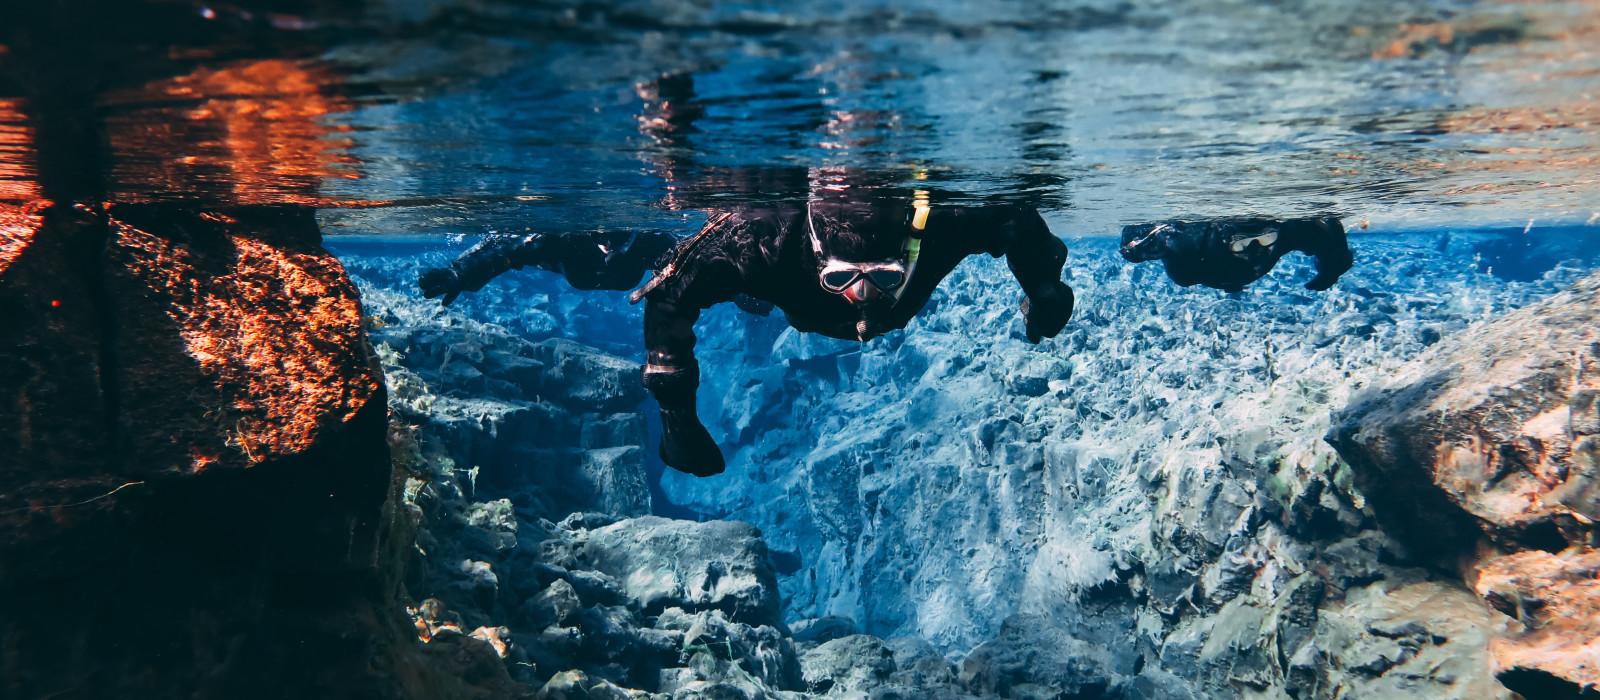 Reiseziel Thingvellir Nationalpark Island